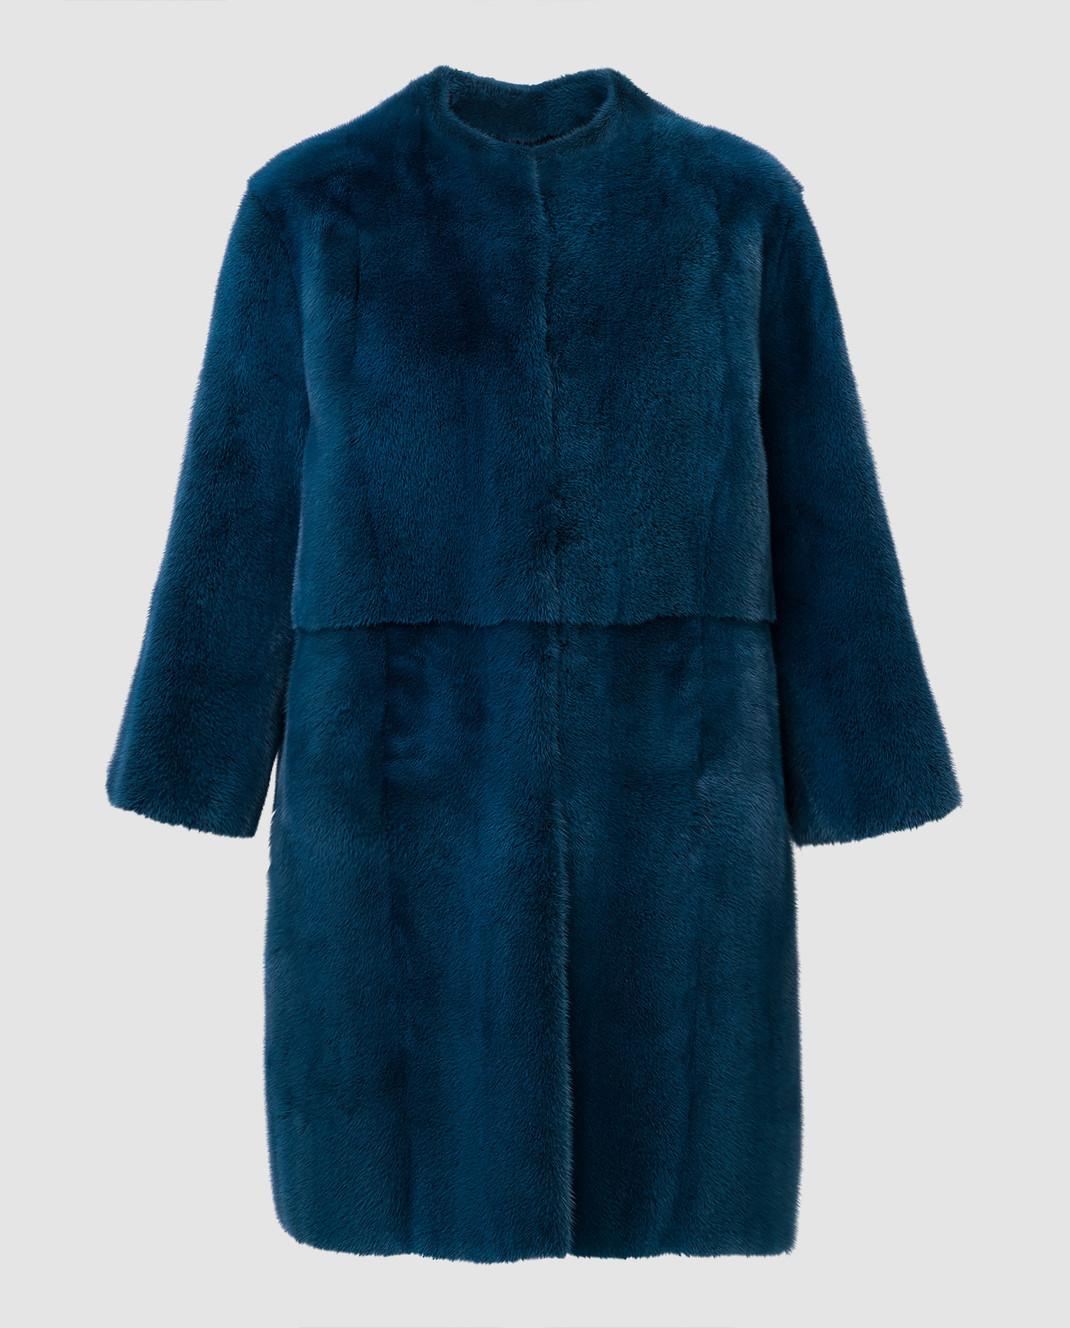 Fabio Gavazzi Синяя шуба из меха норки 9VI000F18FG92PIVR